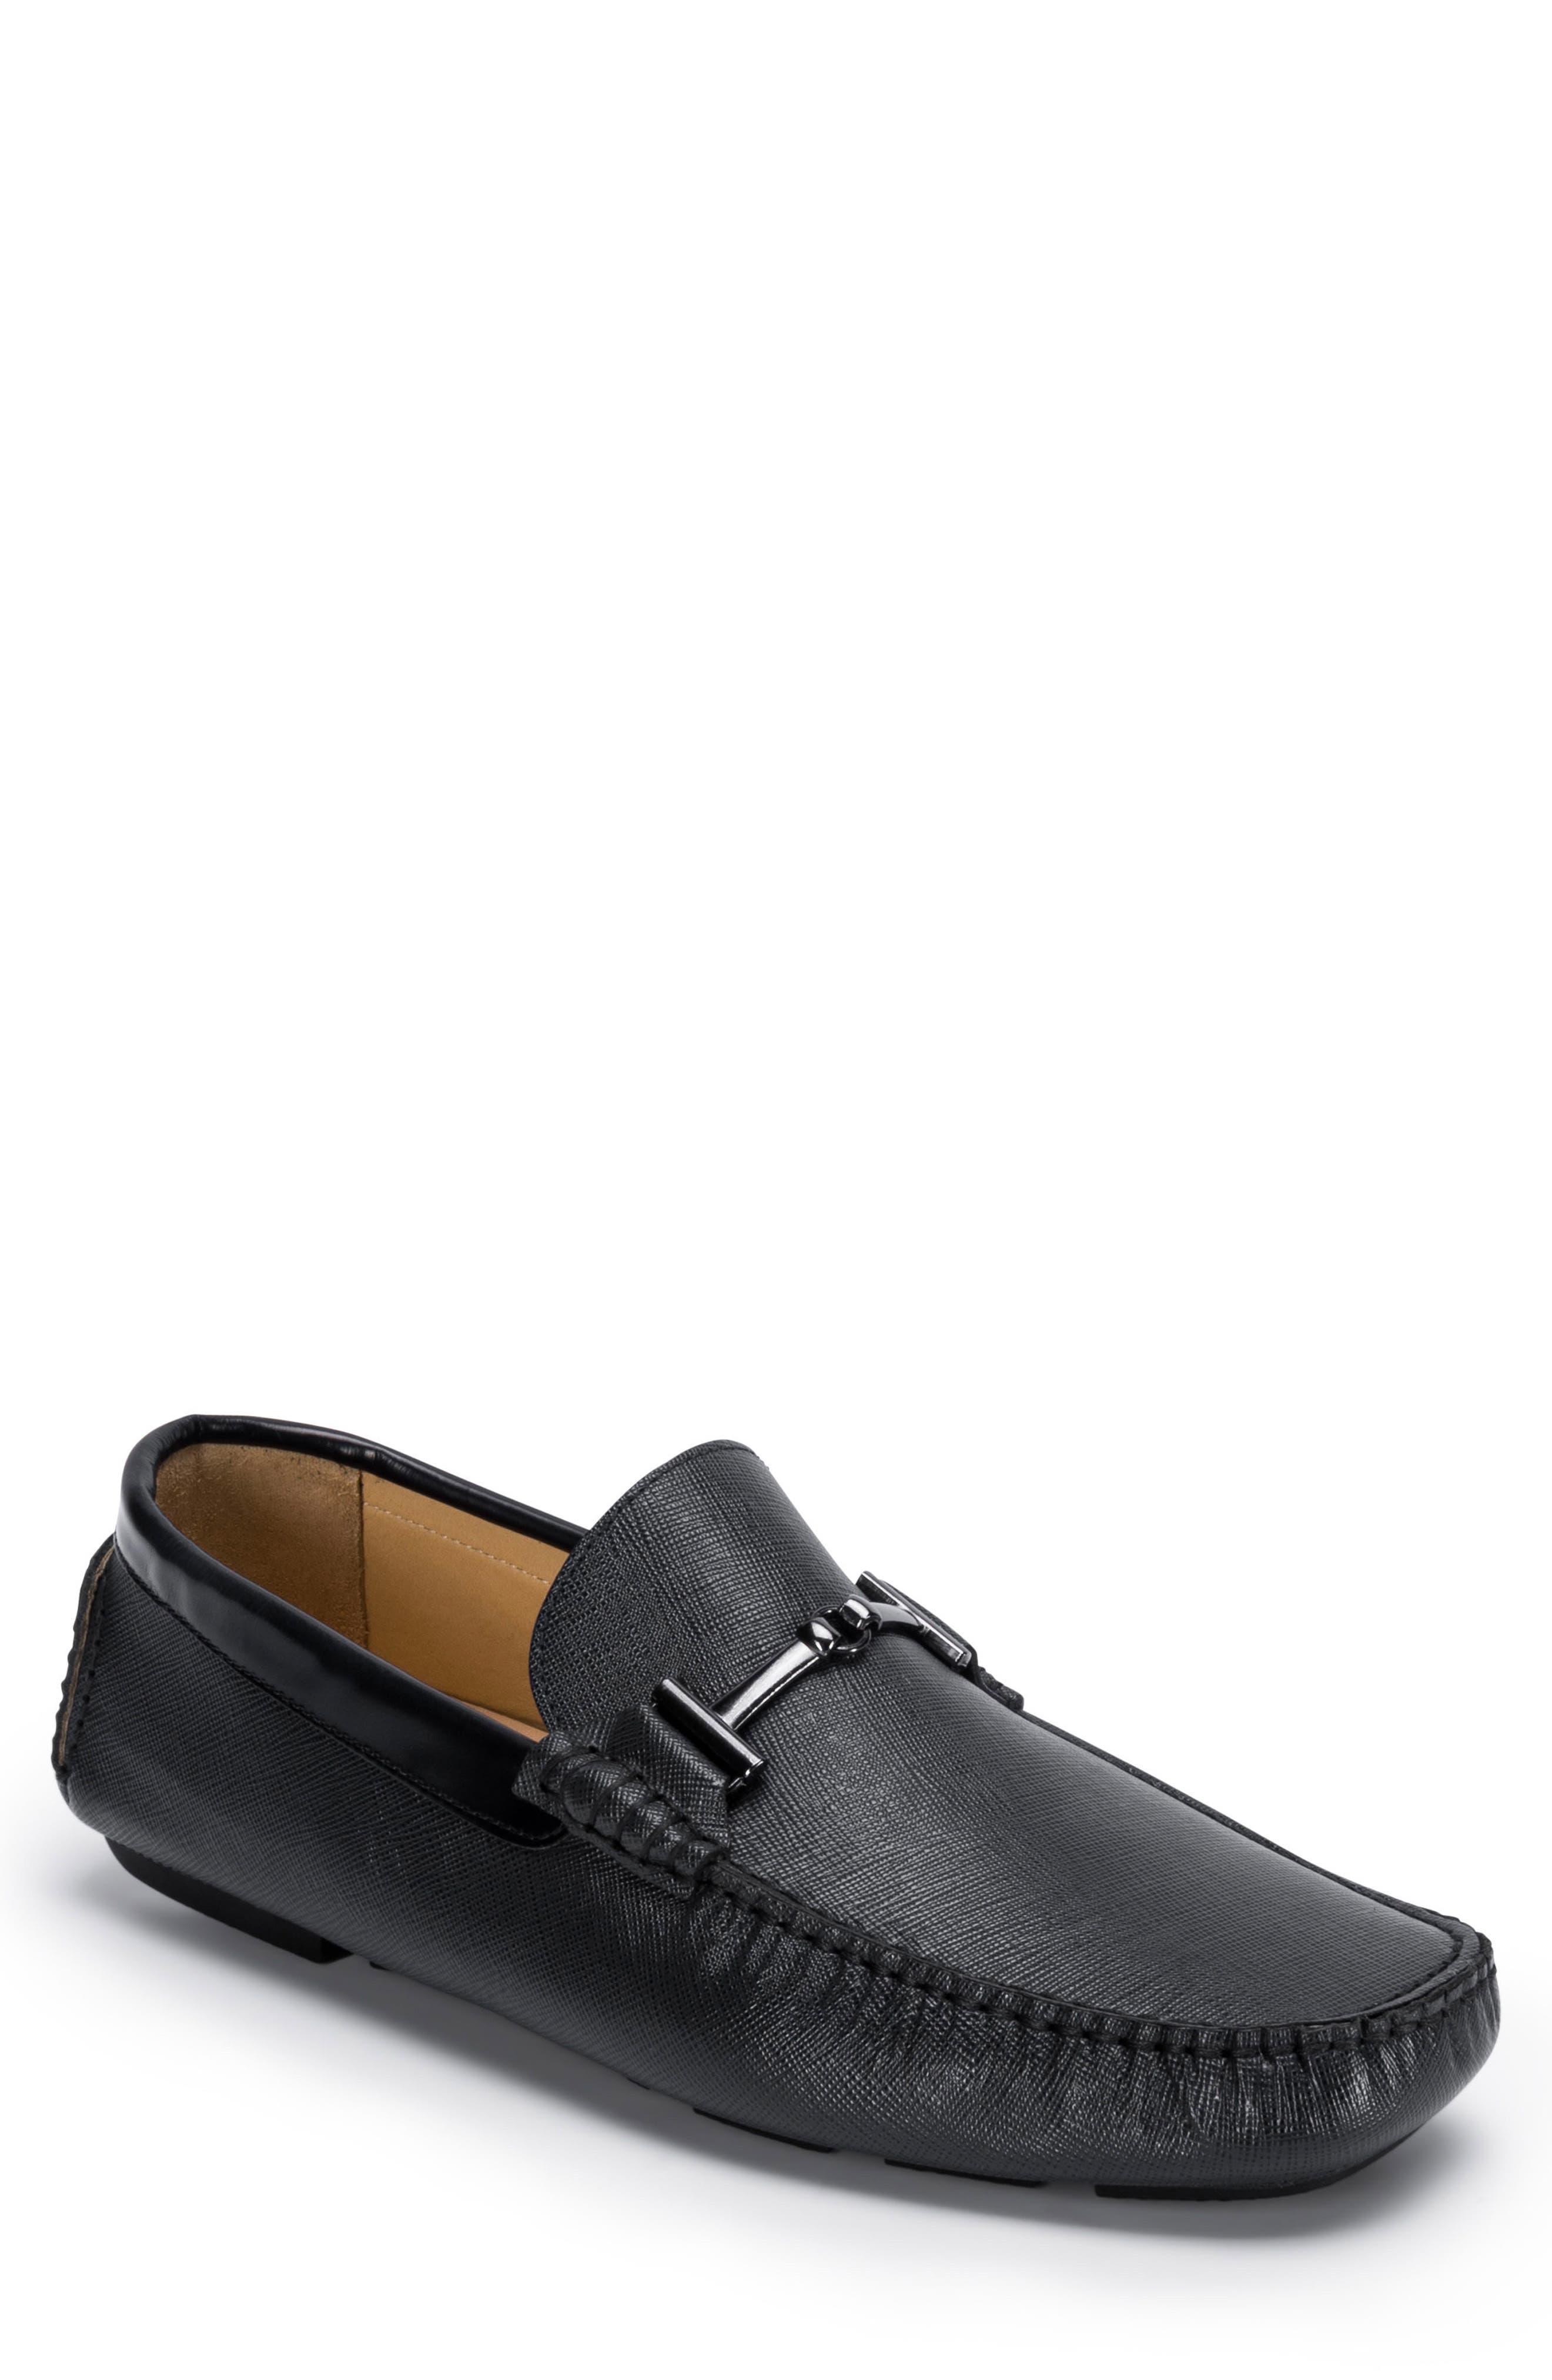 Capri Driving Shoe,                         Main,                         color, Black